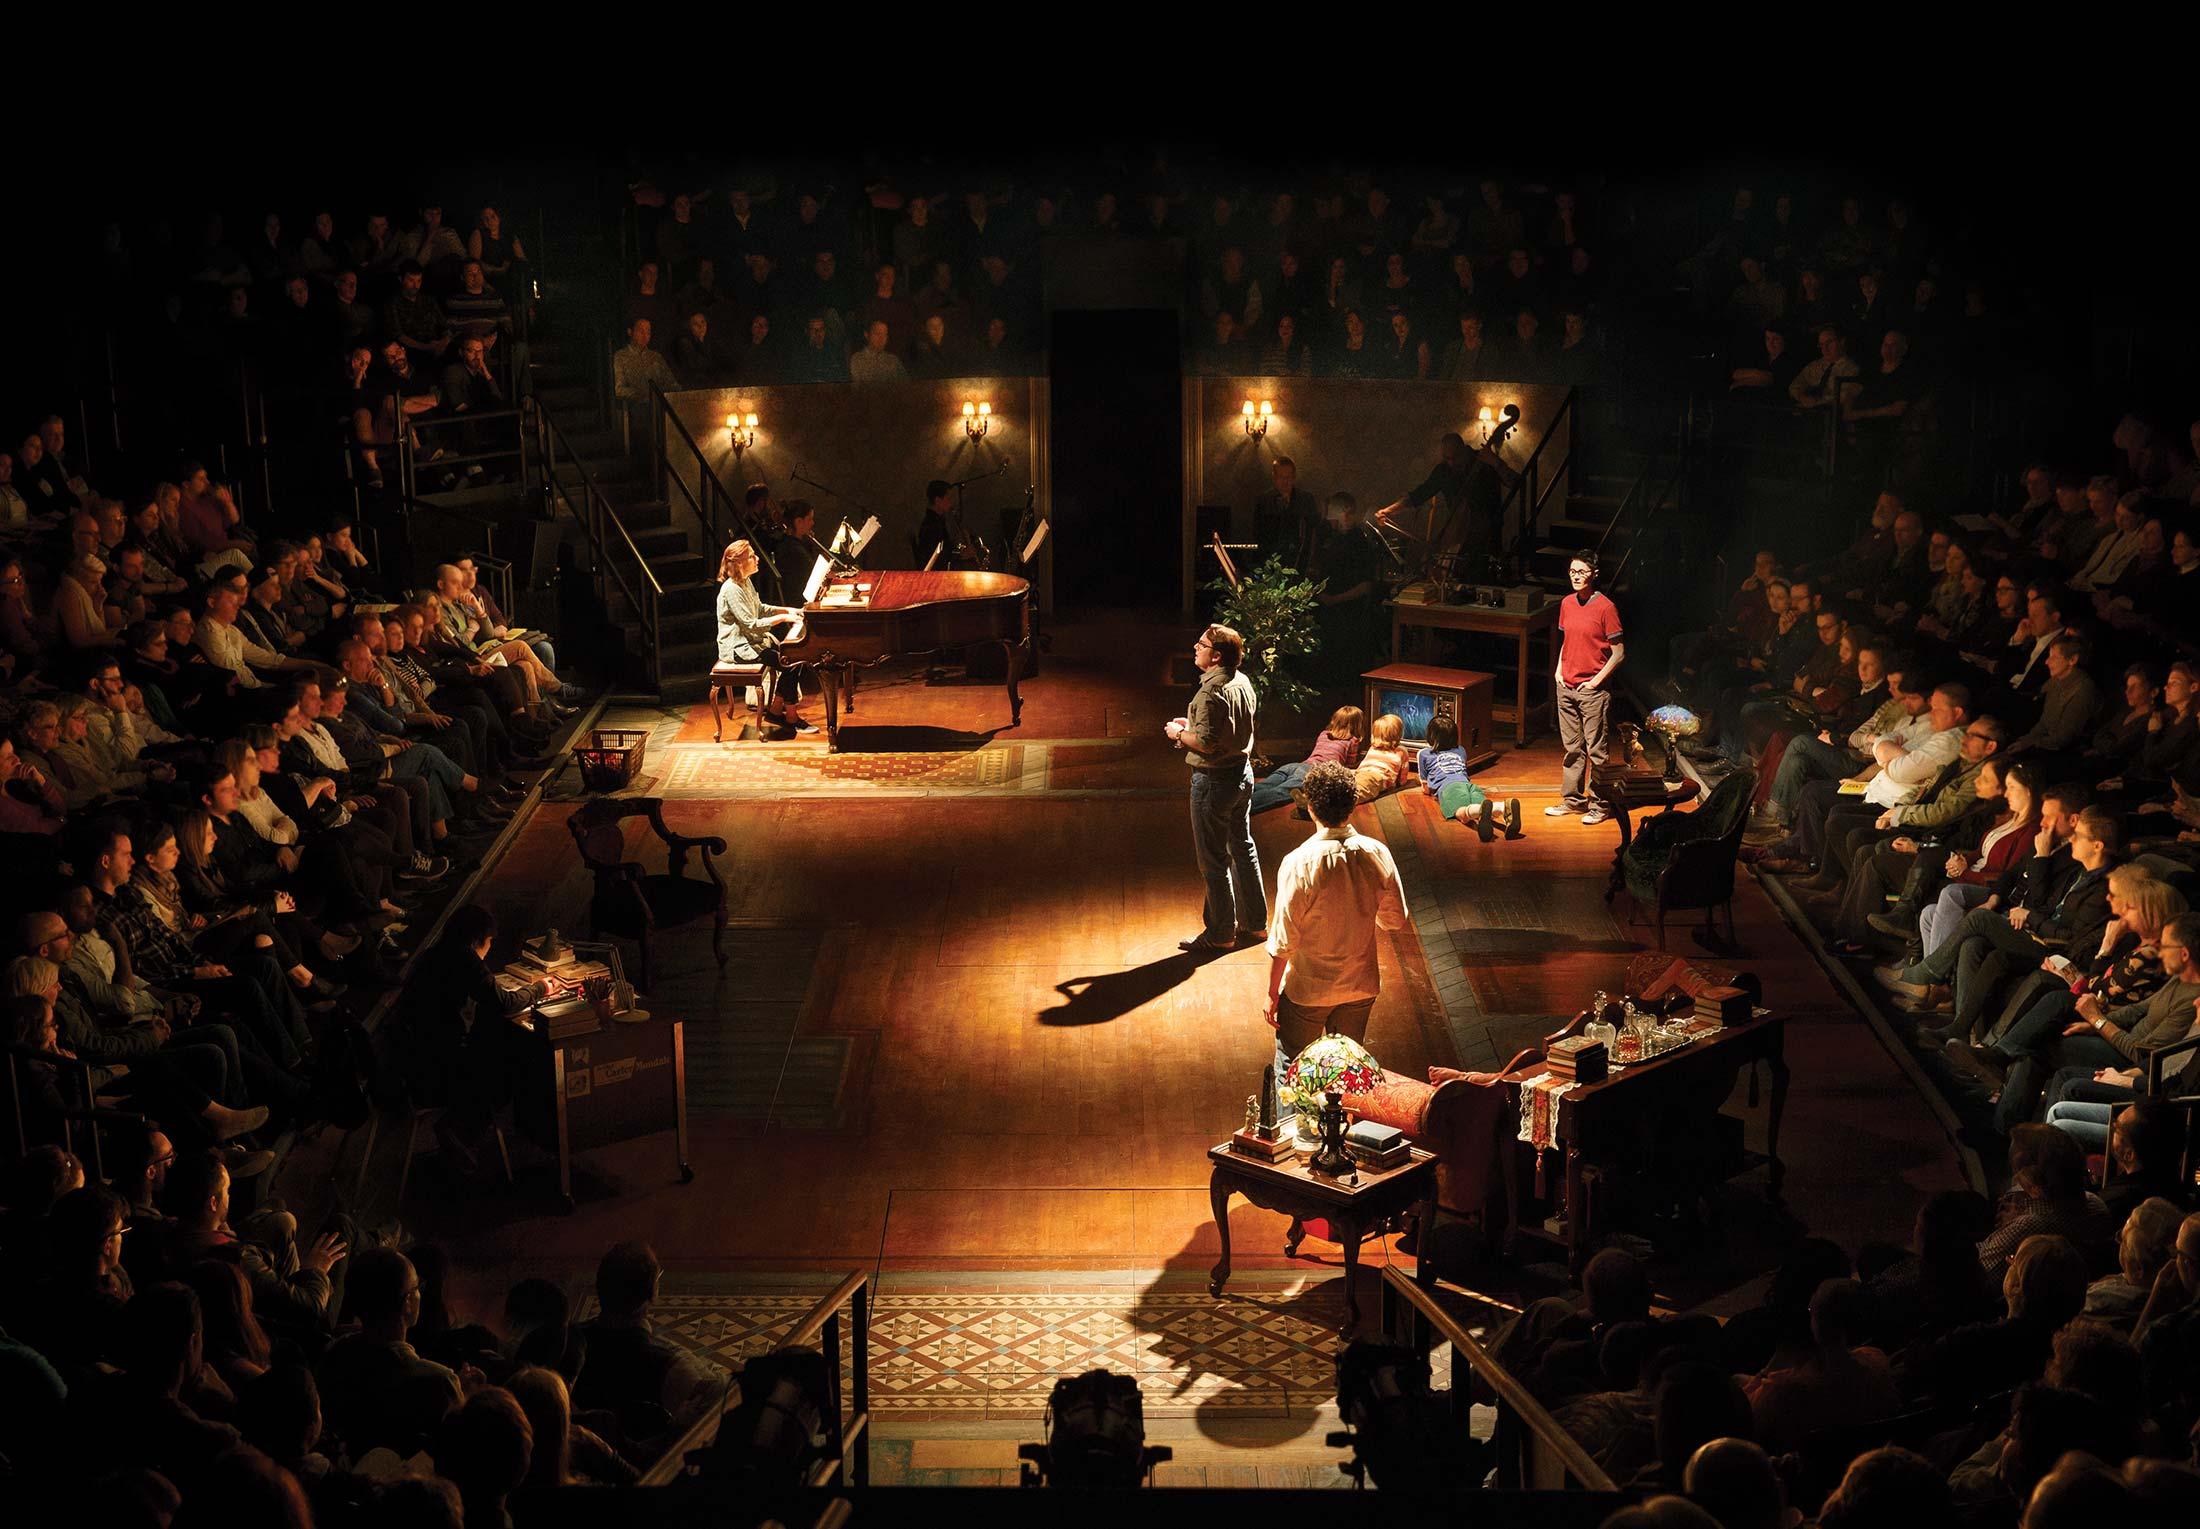 Momento del musical Fun Home, basado en la novela gráfica homónima de Alison Bechdel, ganadora del Lammy a Mejor memoria o biografía. uente: Fun Home Broadway.